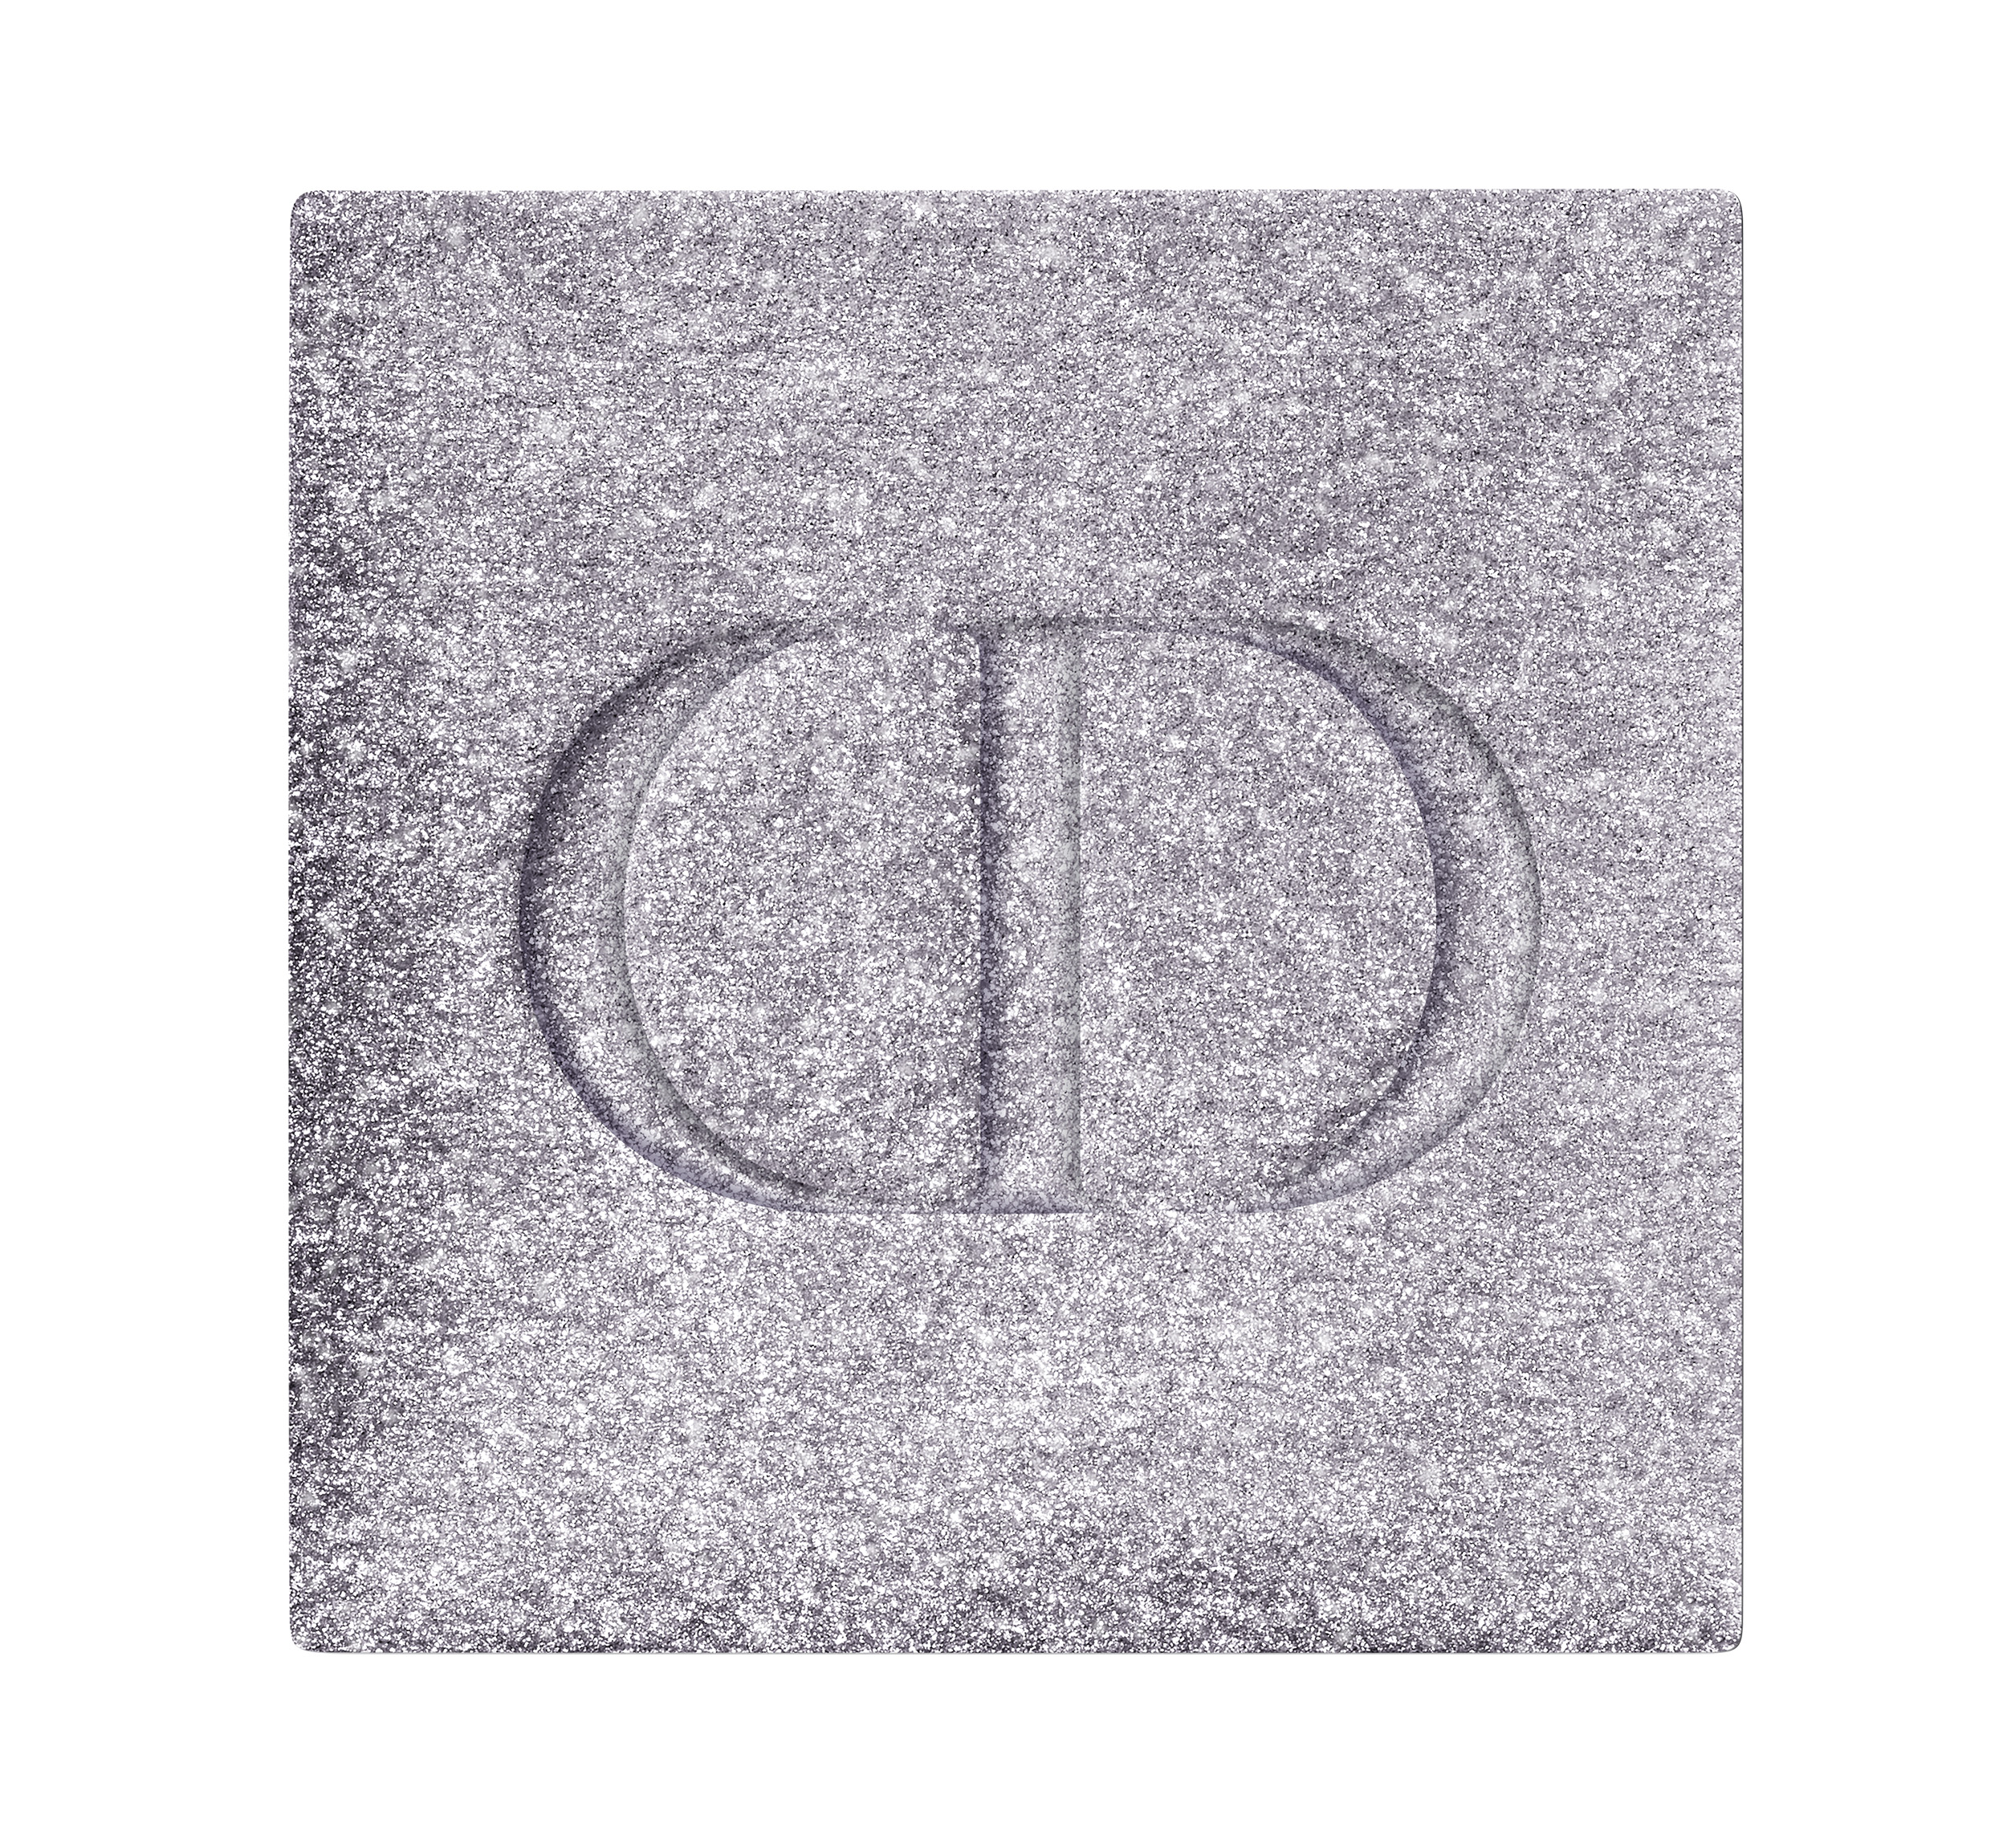 DIOR Mono Couleur Couture Eyeshadow, 045 gris dior